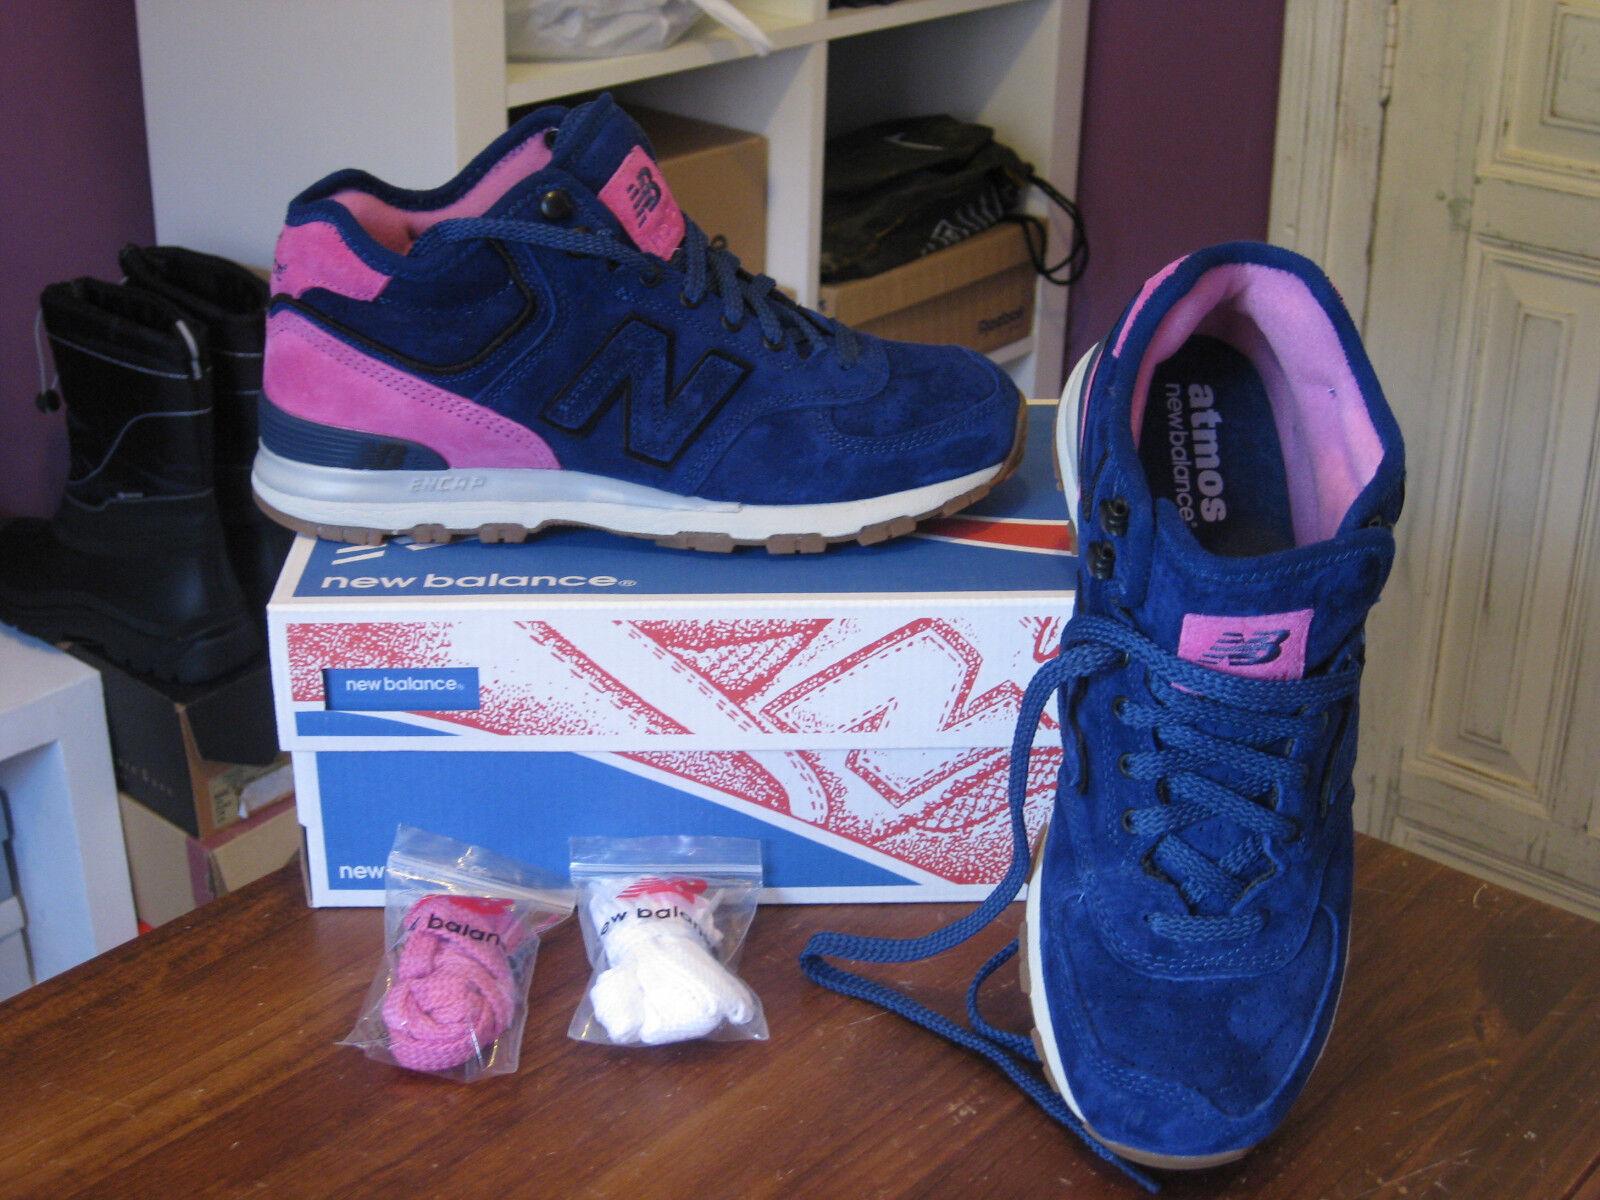 ZAPATILLAS NEW BALANCE 574 ATMOS JAPAN 8  LIMITED EDITION zapatos